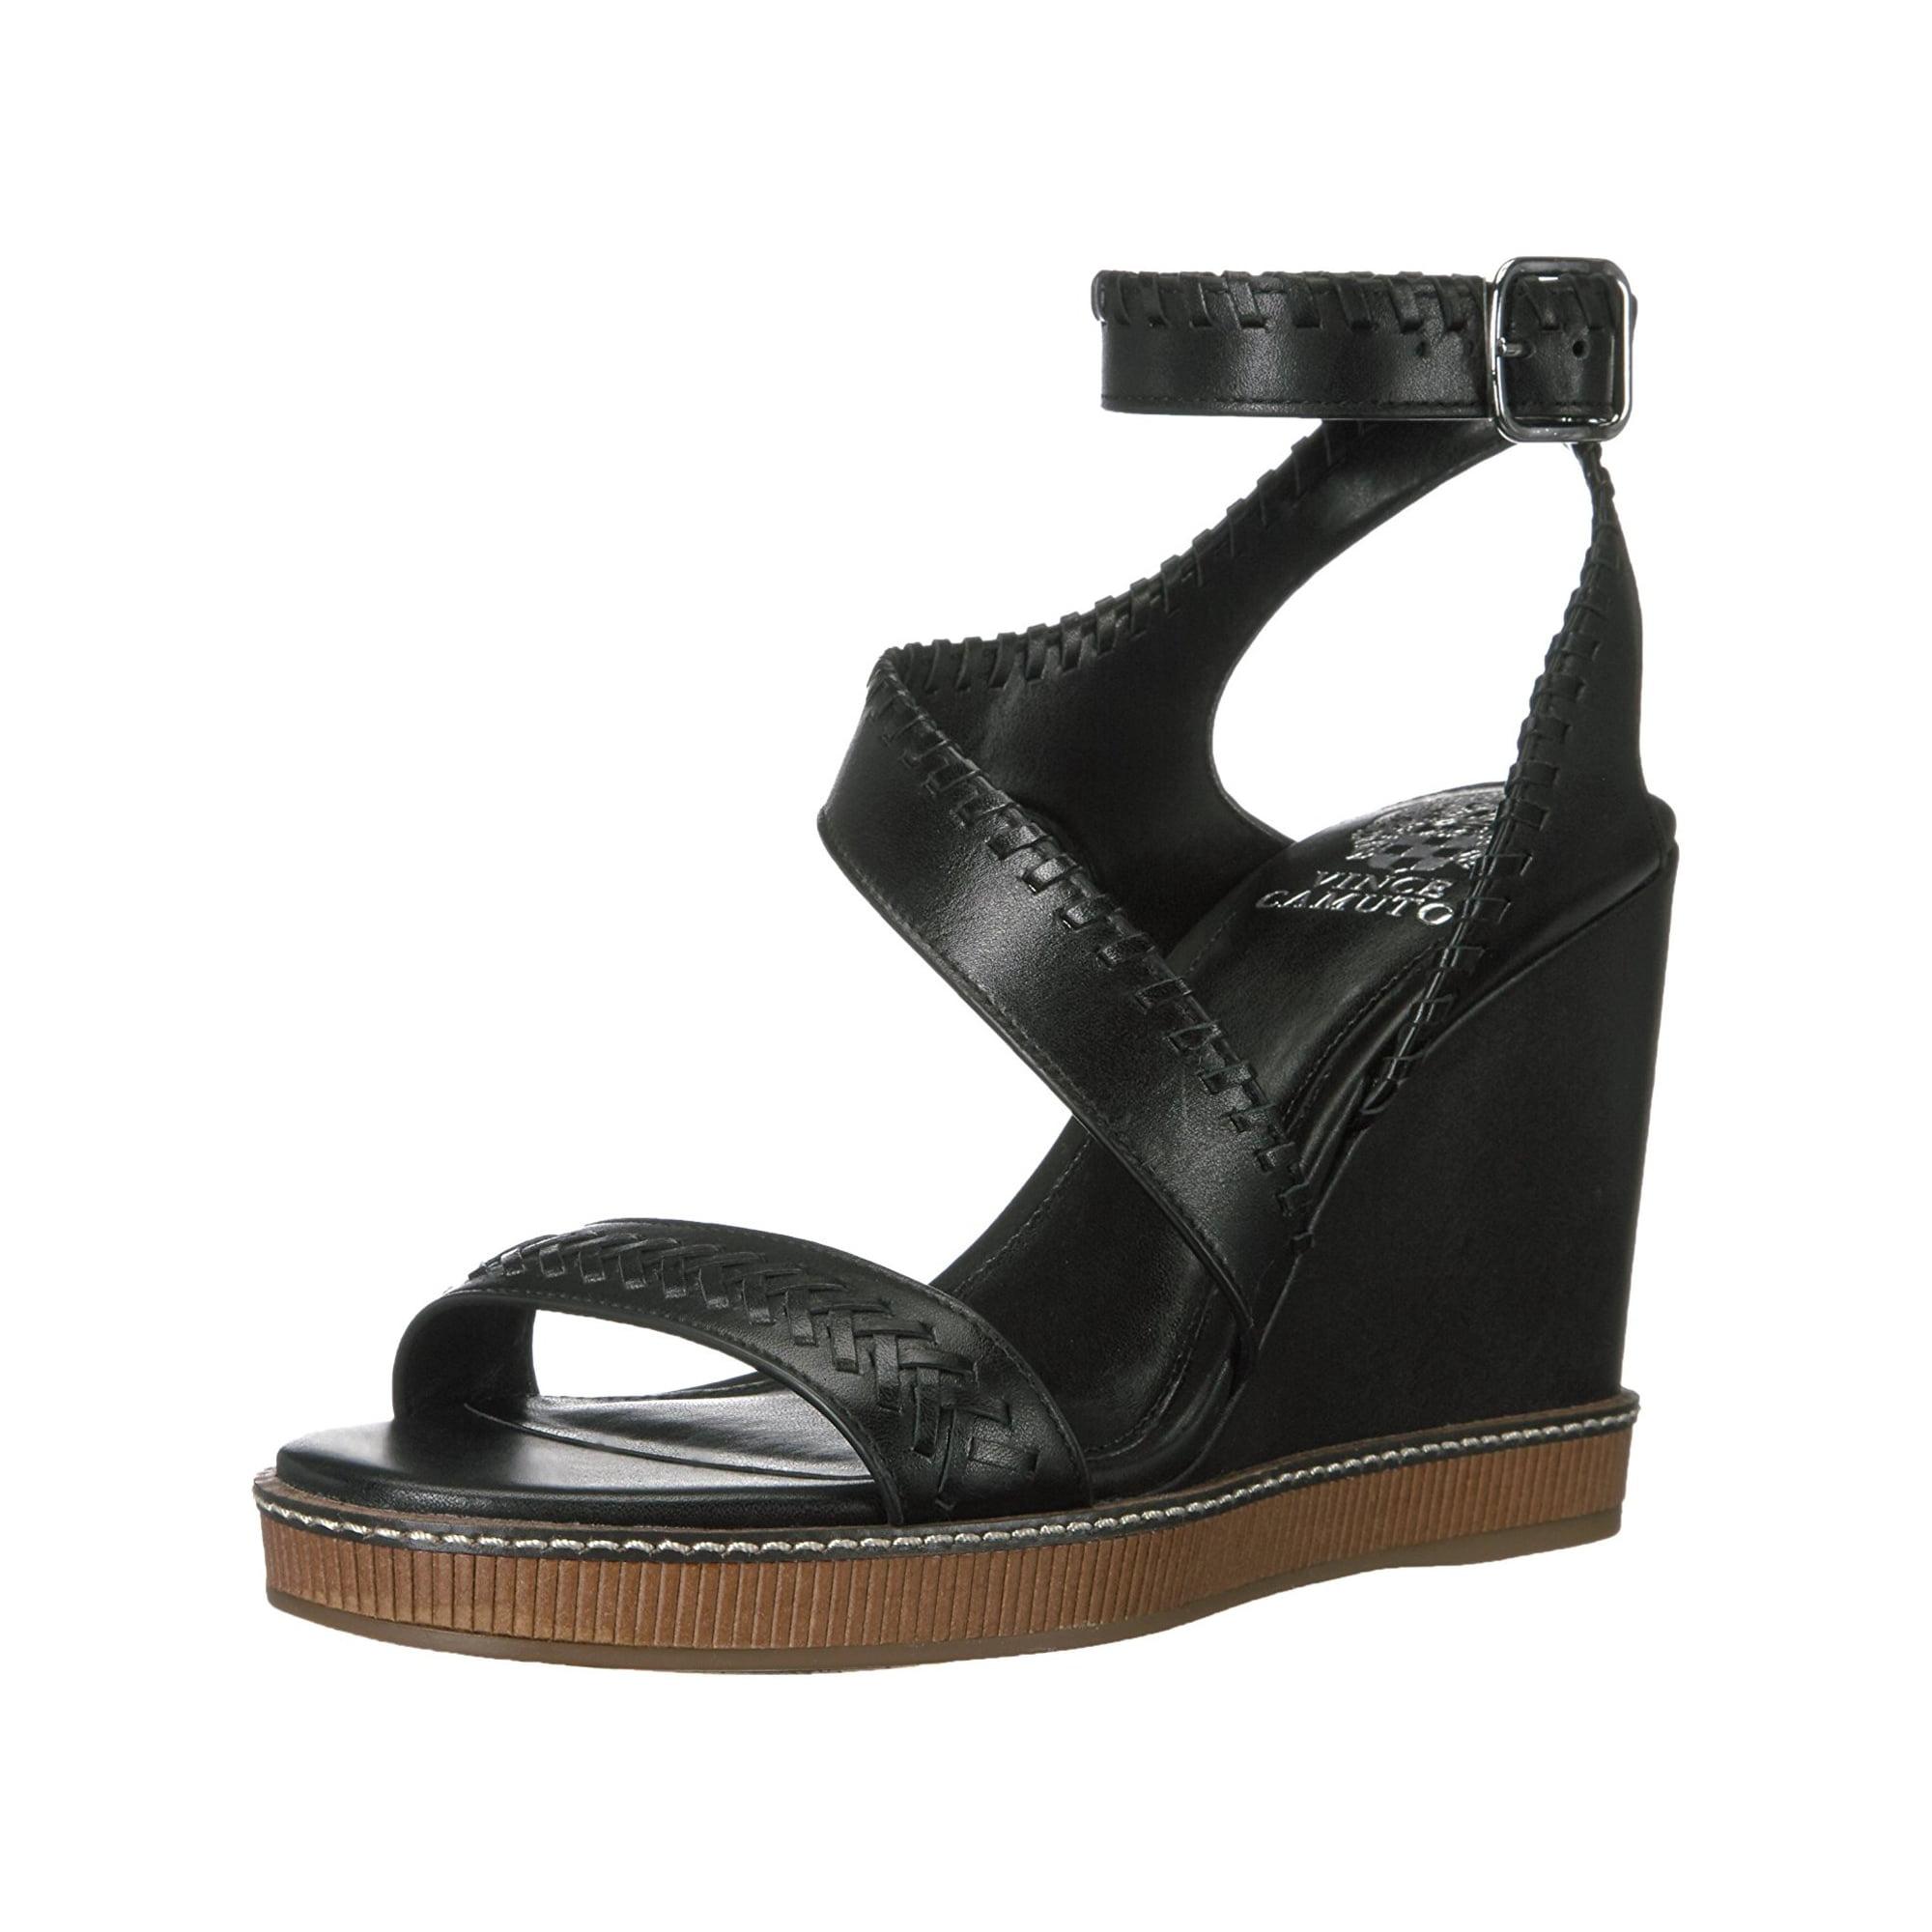 2d335ed2a951 Vince Camuto Womens Ivanta Leather Open Toe Casual Platform ...